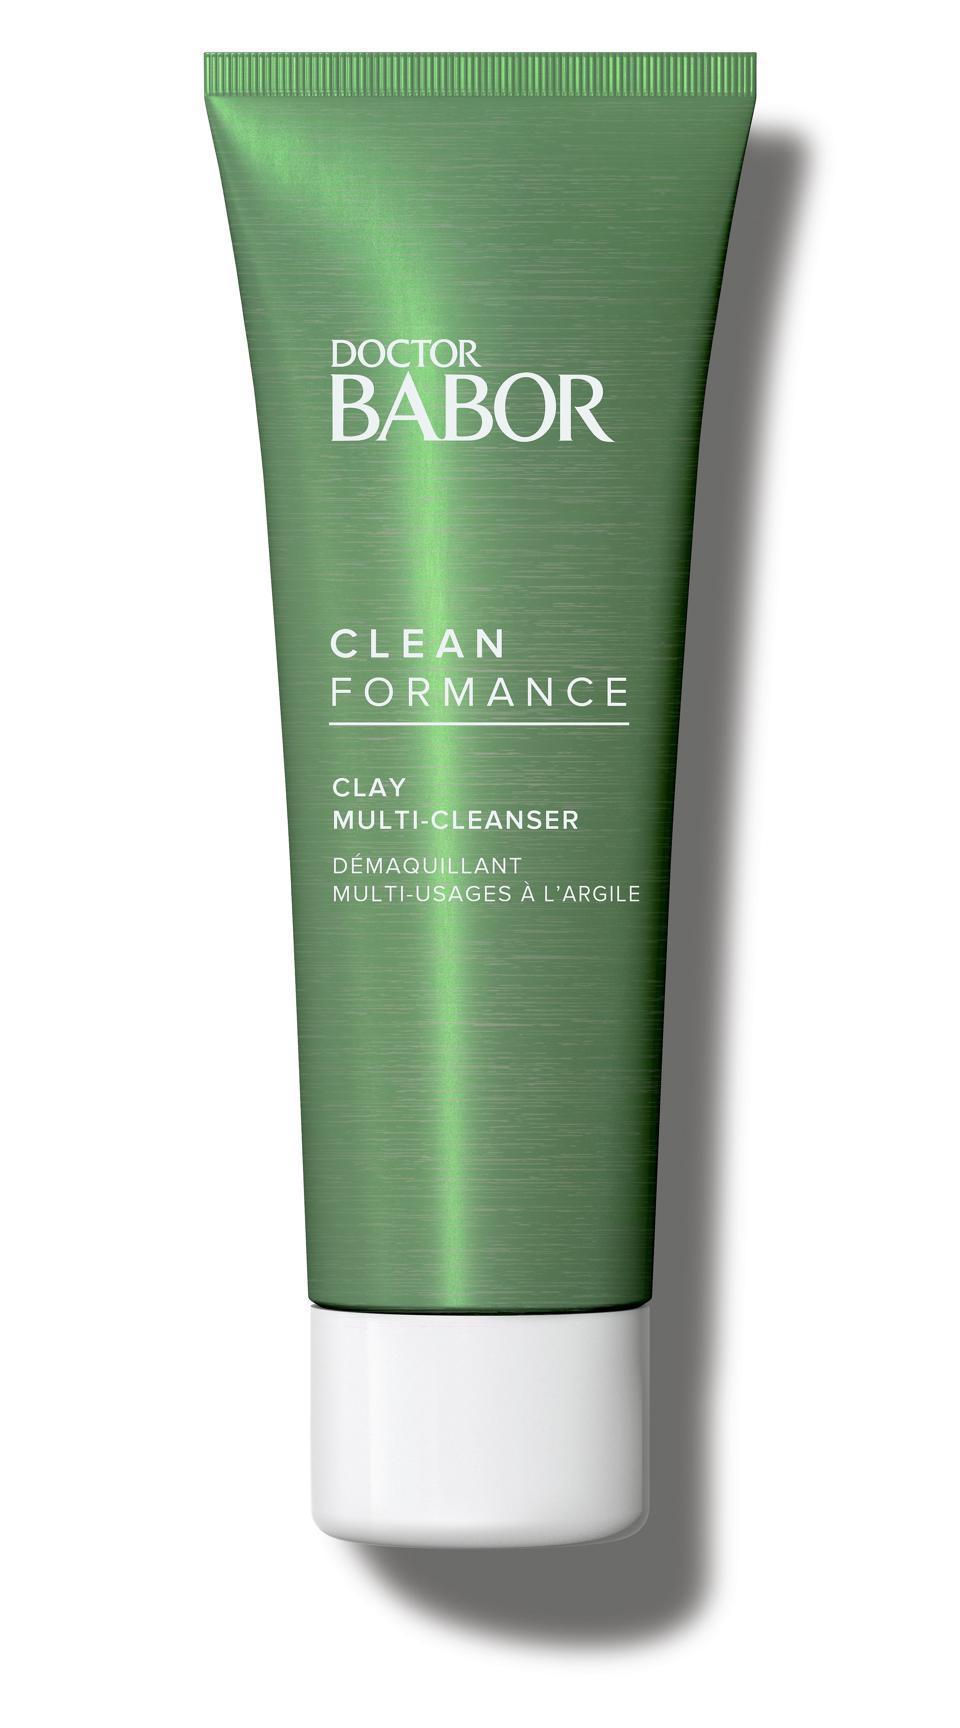 Очищающее средство на основе глины  Doctor Babor Clean Formance Clay Multi-Cleanser 50 мл